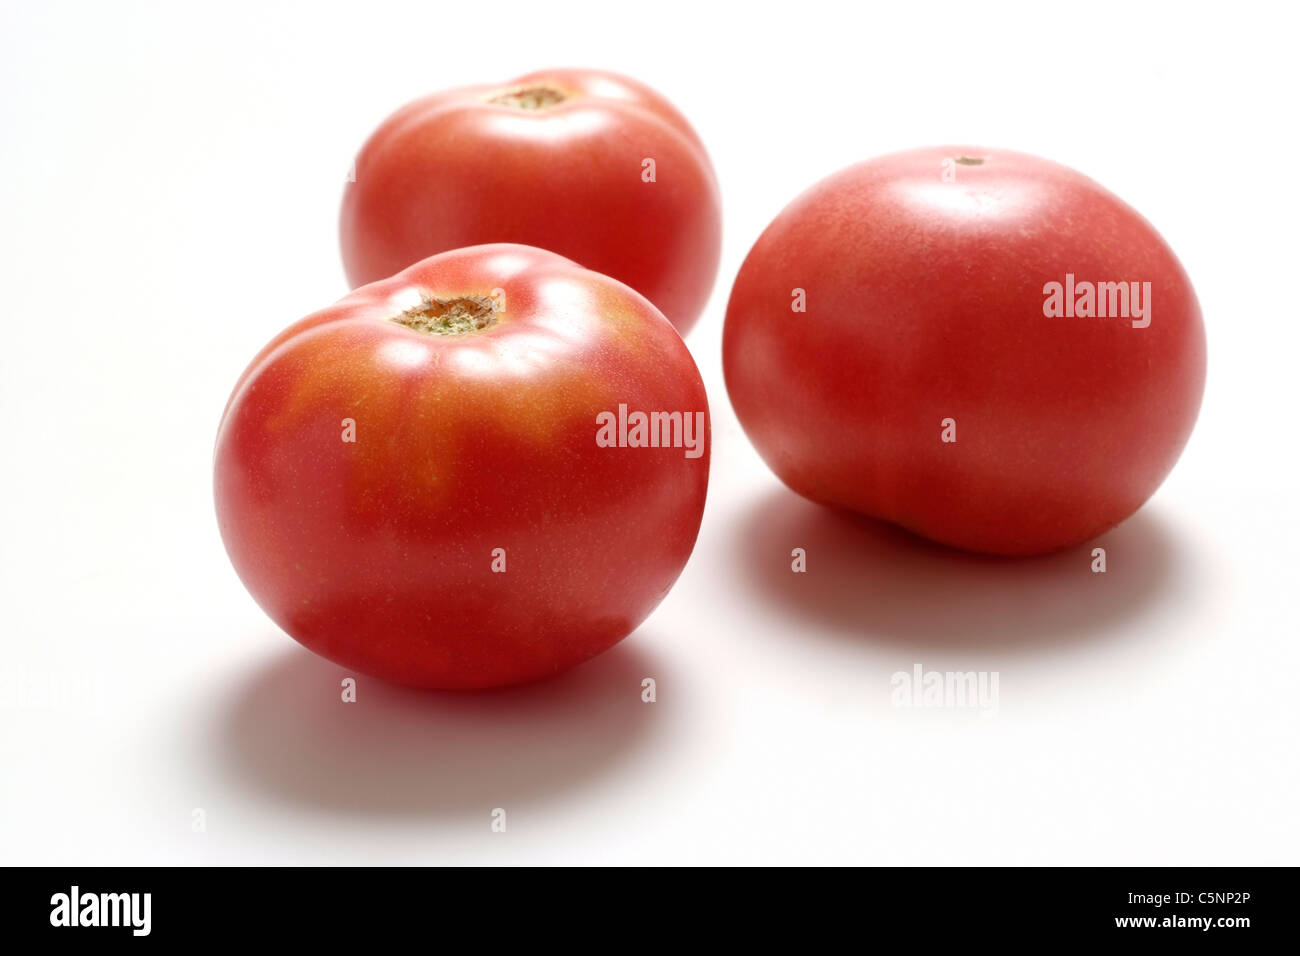 Tomato varieties: Red russian tomato - Stock Image